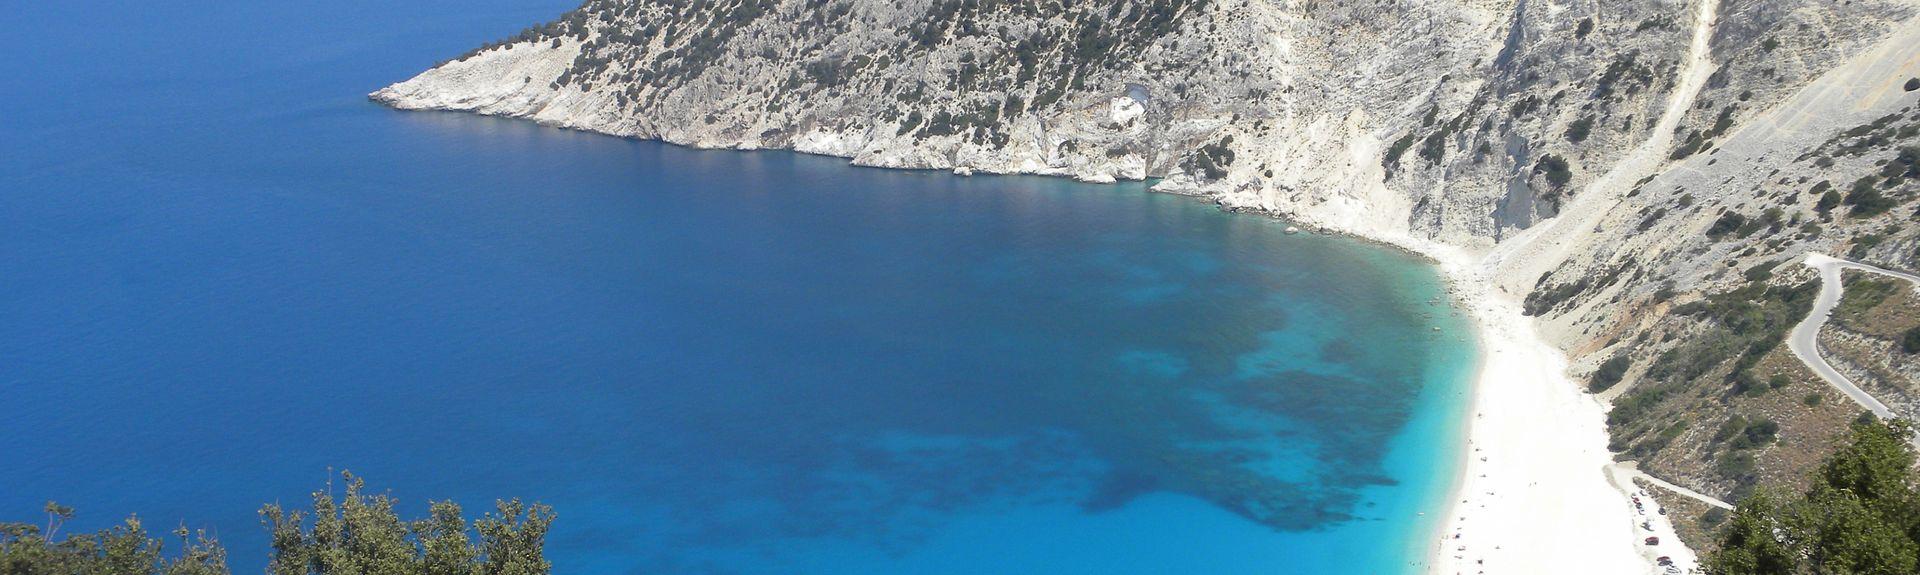 Myrtos Beach, Kefalonia, Ionian Islands Region, Greece